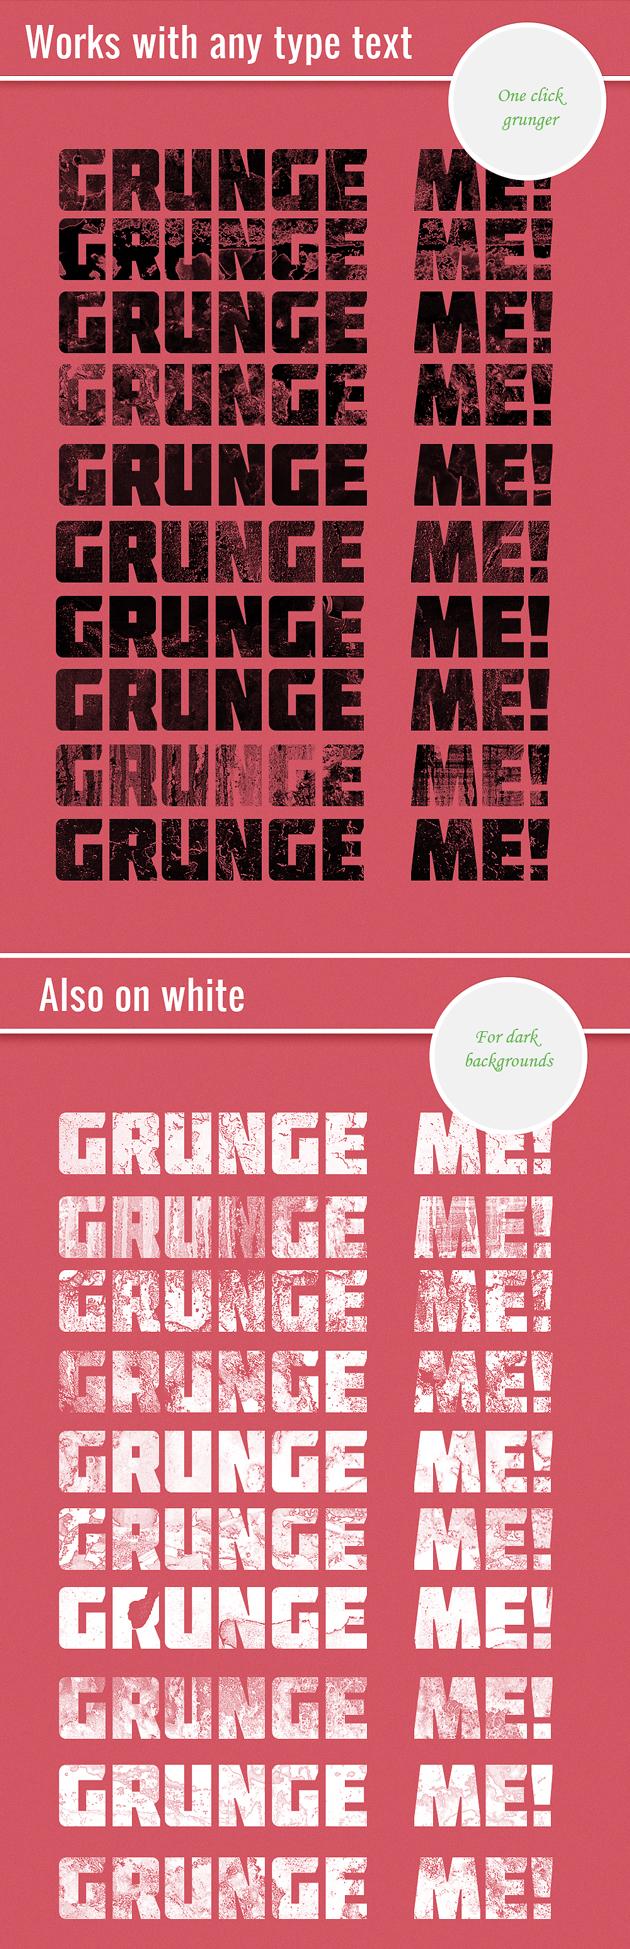 Grunge-Text-Photoshop-Styles designtnt addons grunge text styles 1 large